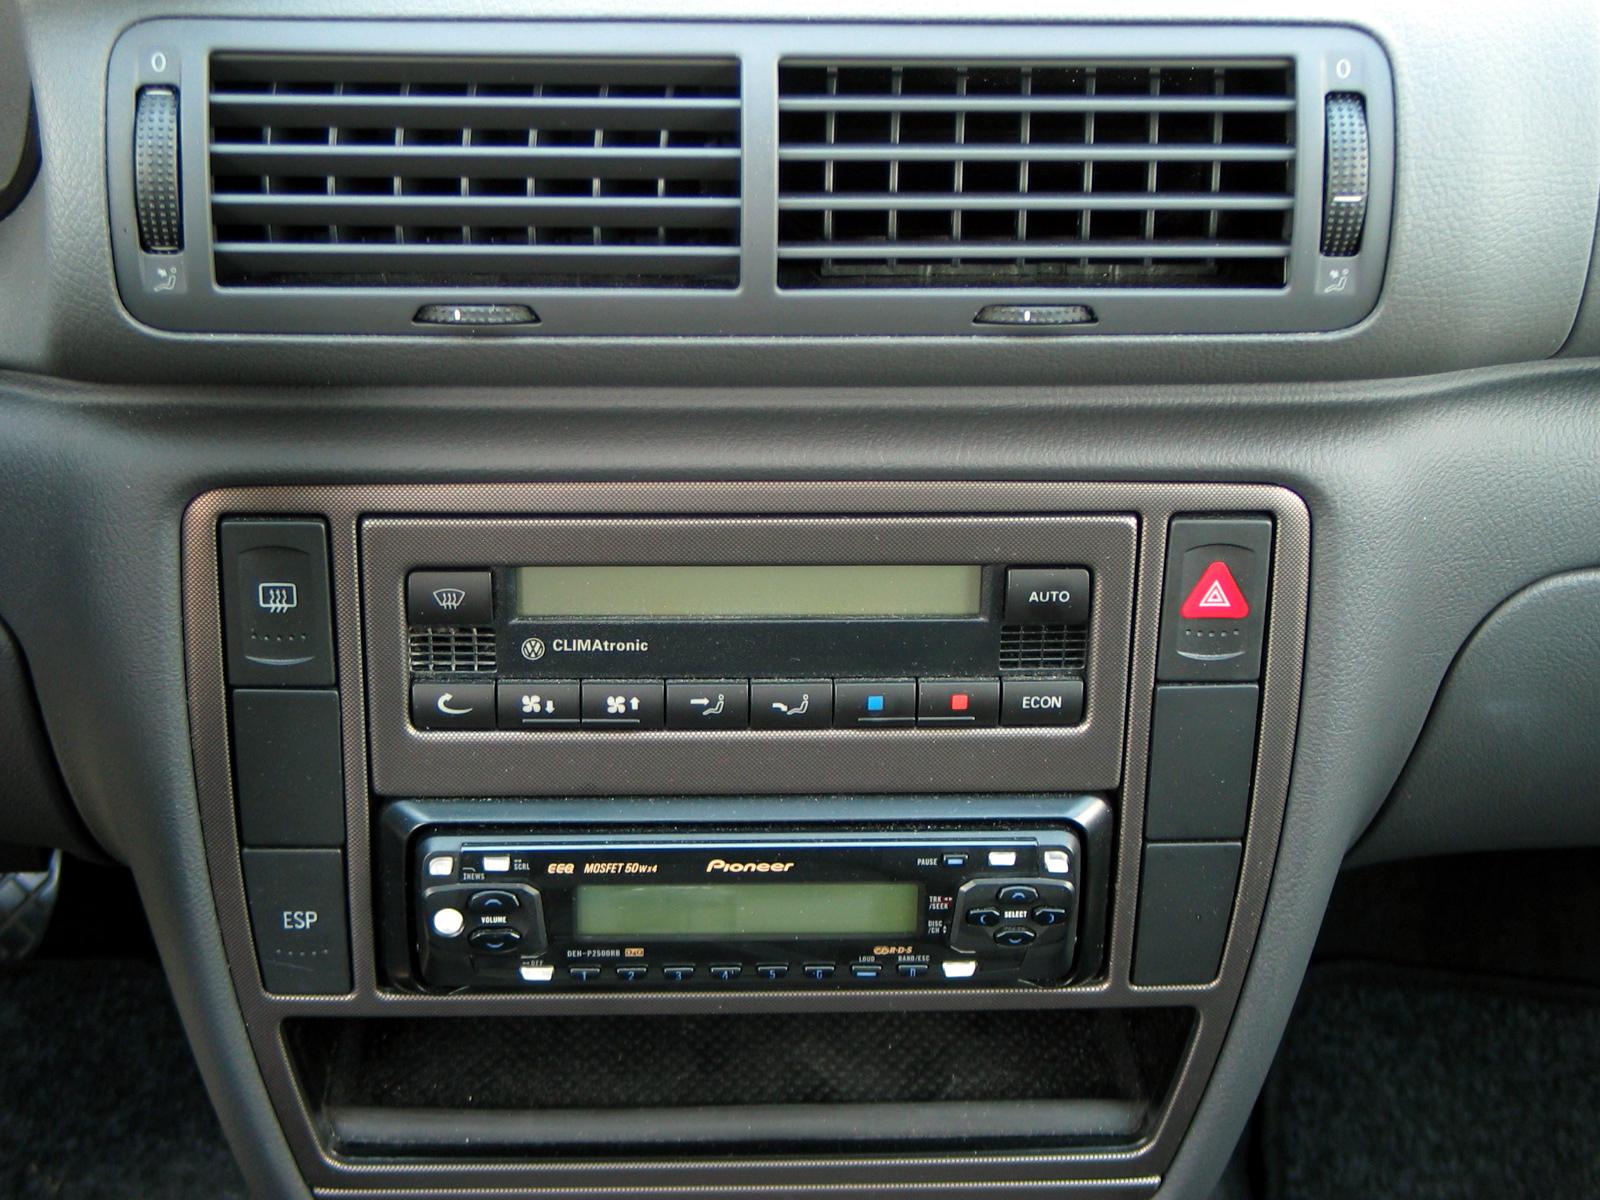 cd cd multi changer passat b5 5 rh passatworld com VW Passat B5 Tuning VW Passat Wagon